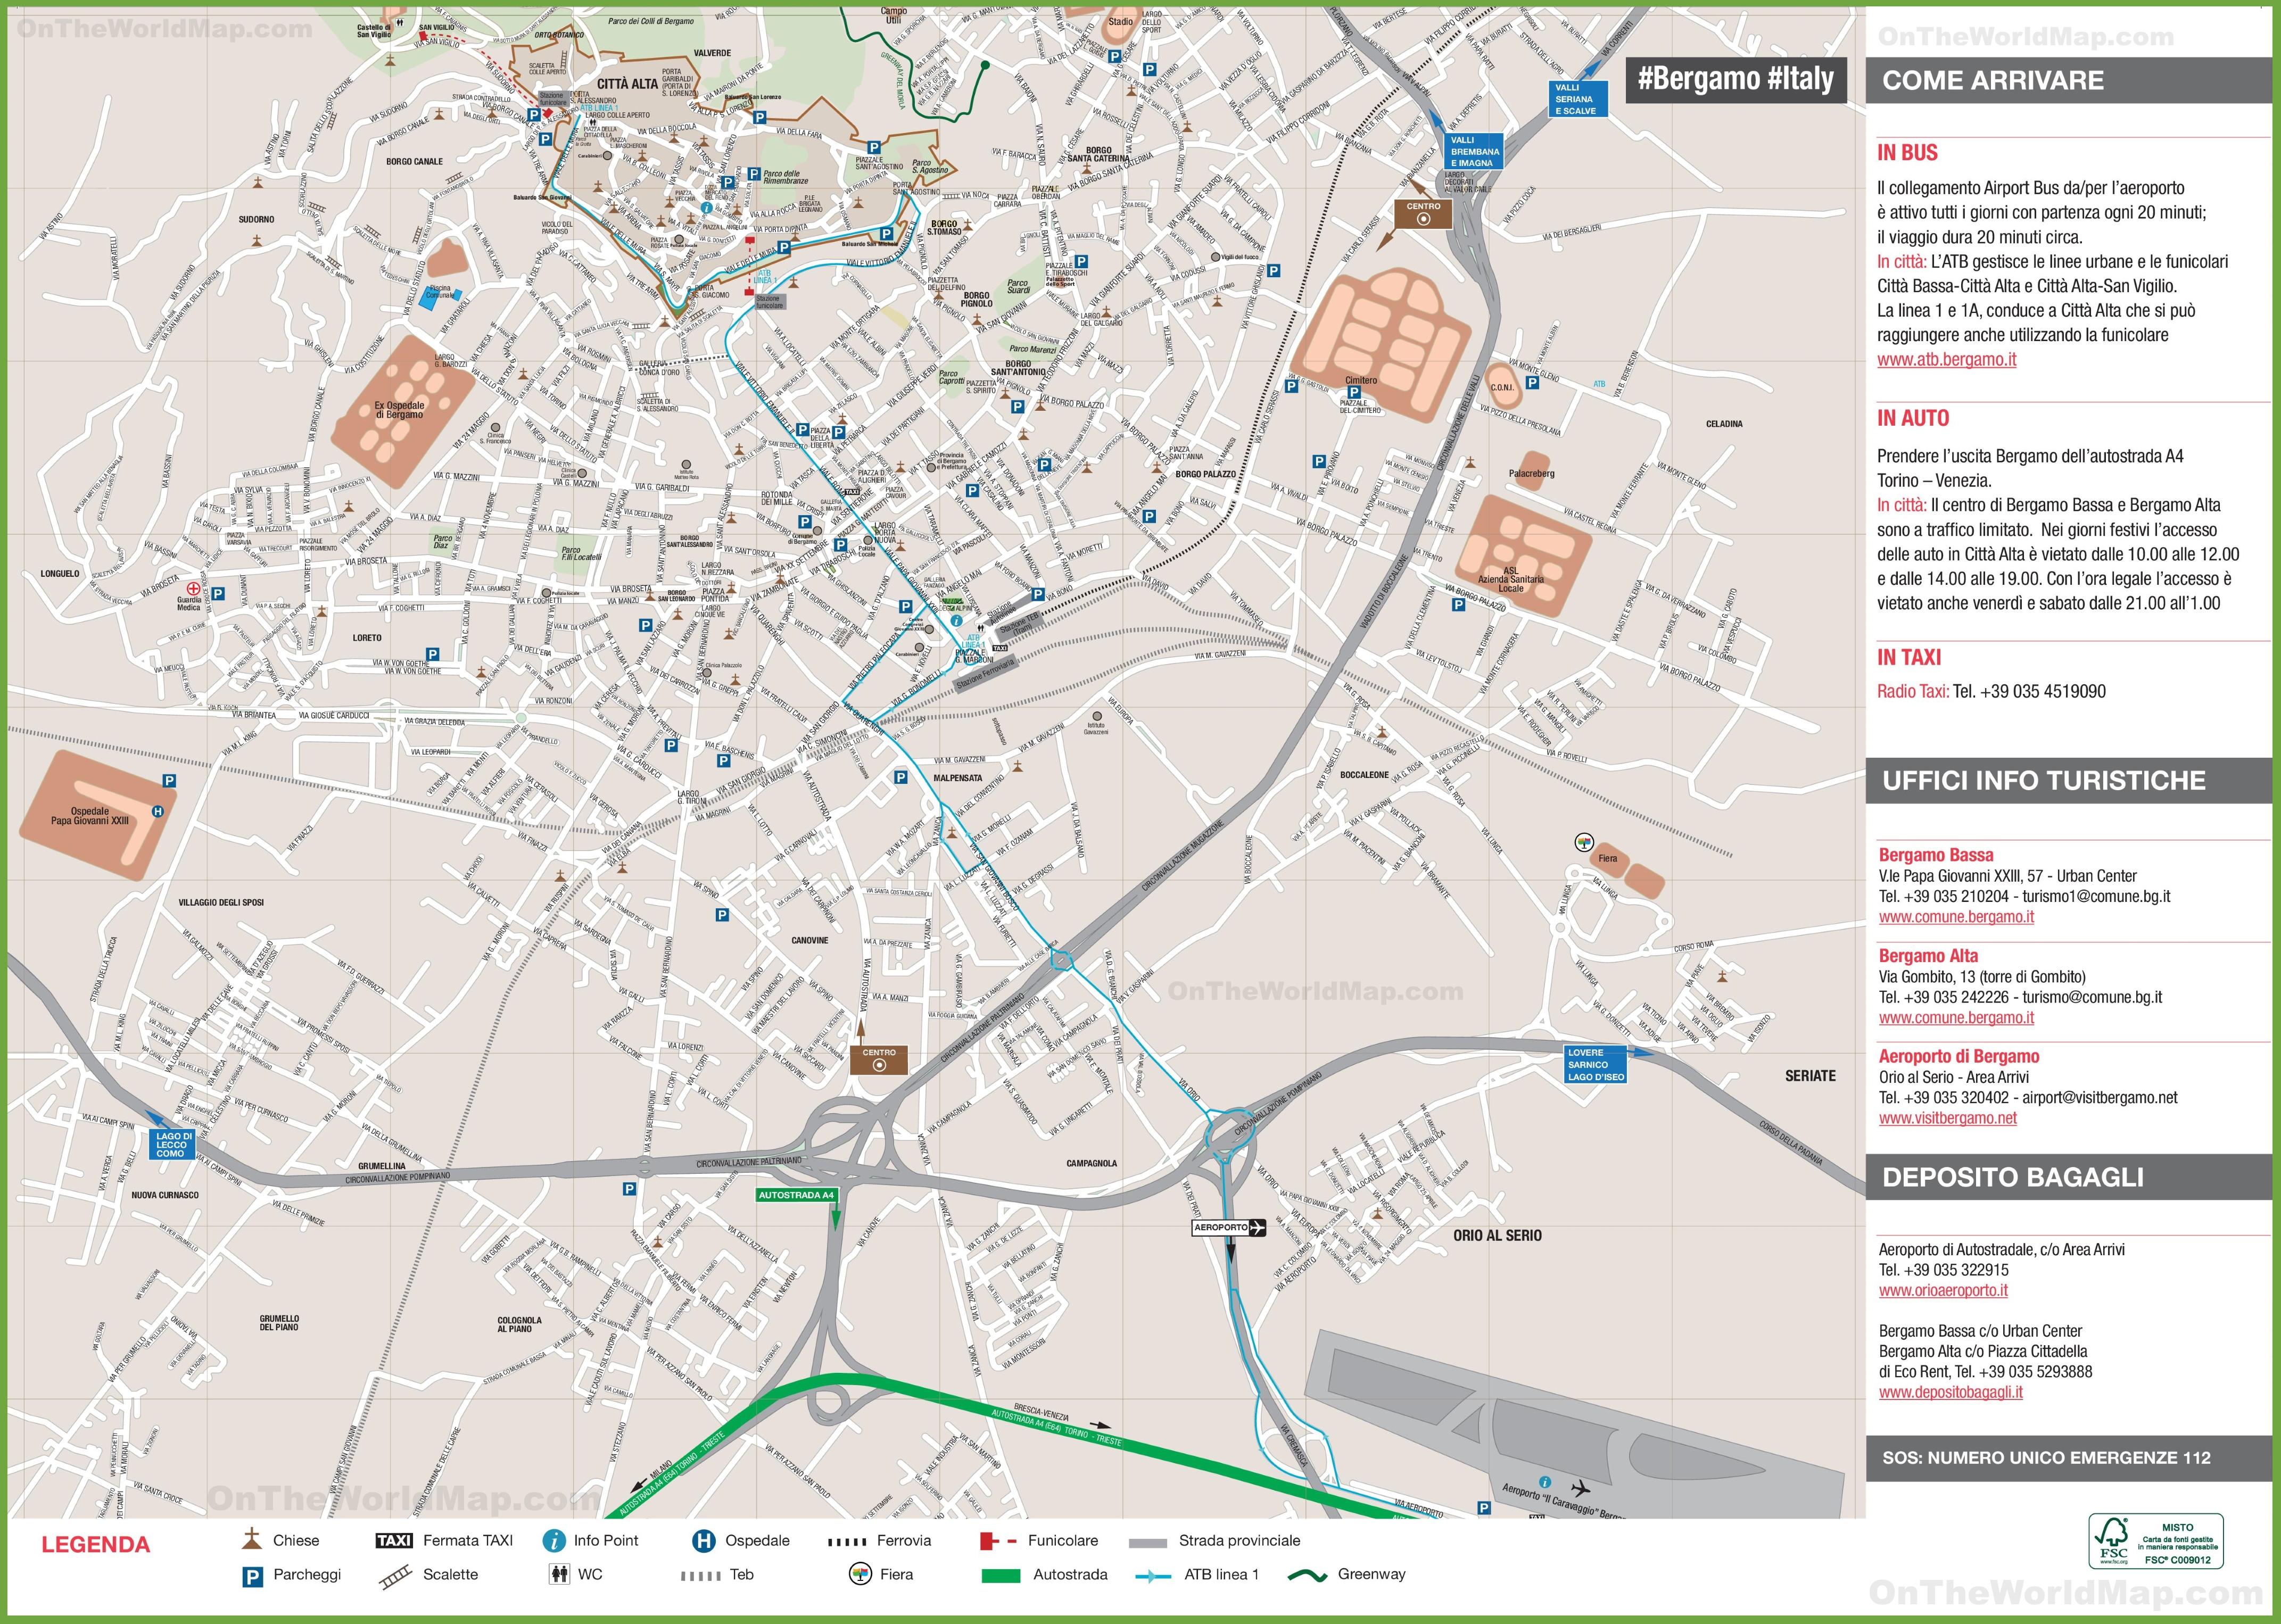 Bergamo tourist map